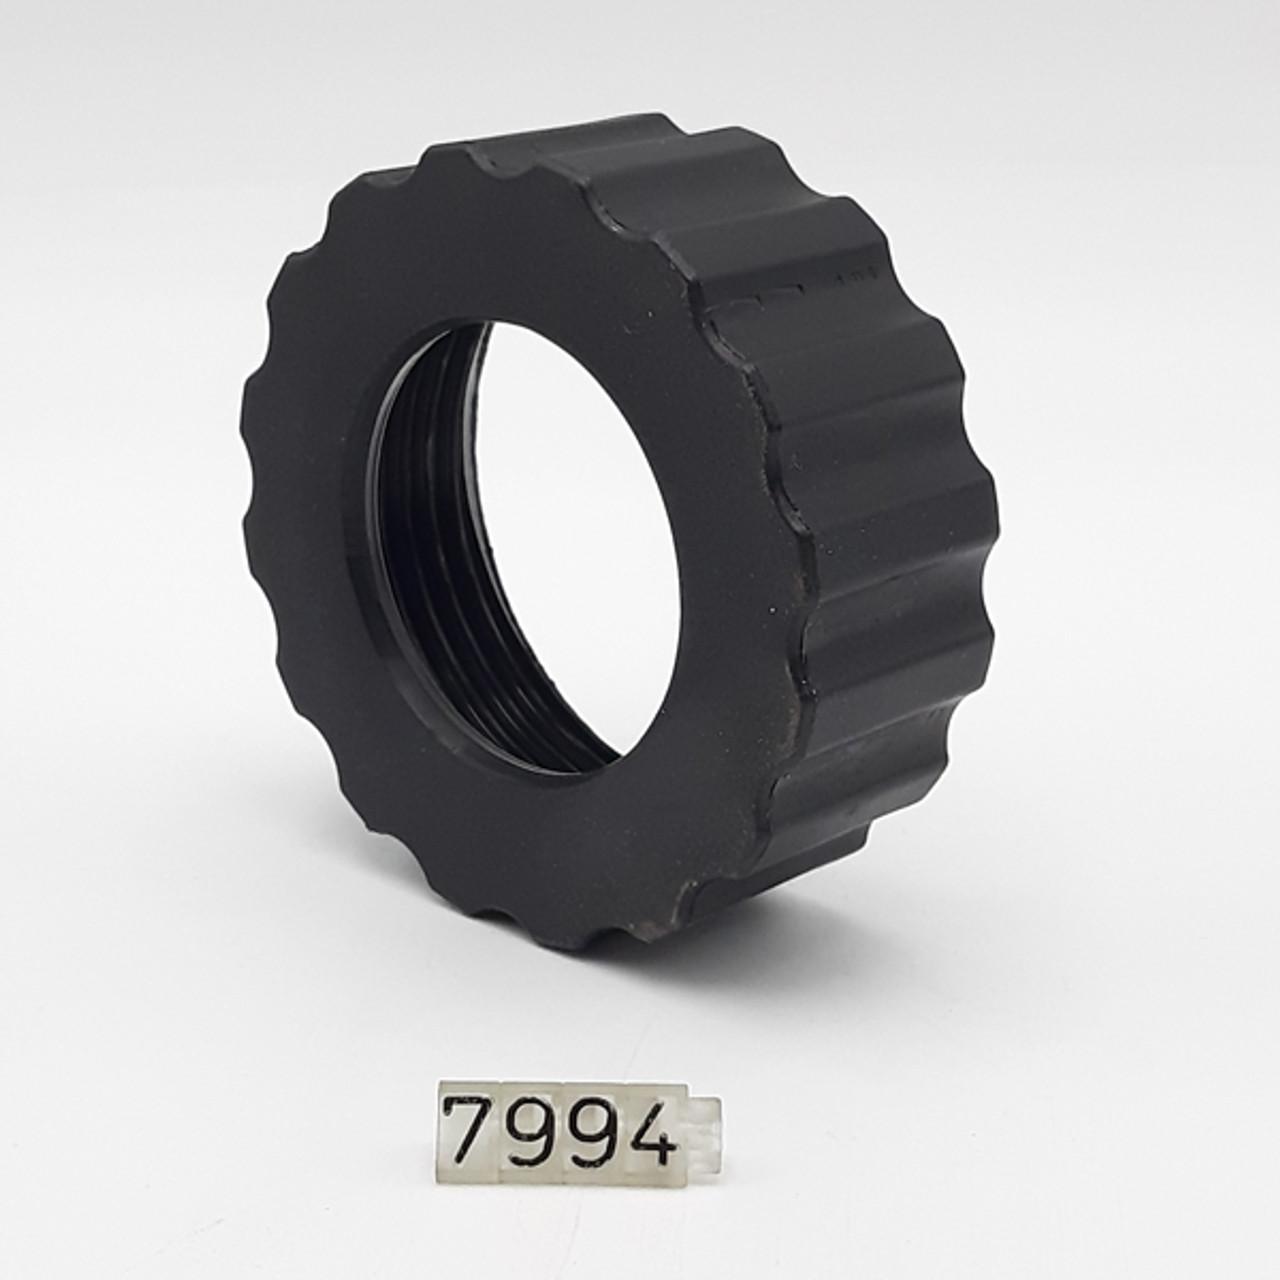 Talsa PF500 - Locking Nut for Portion Head - 7994